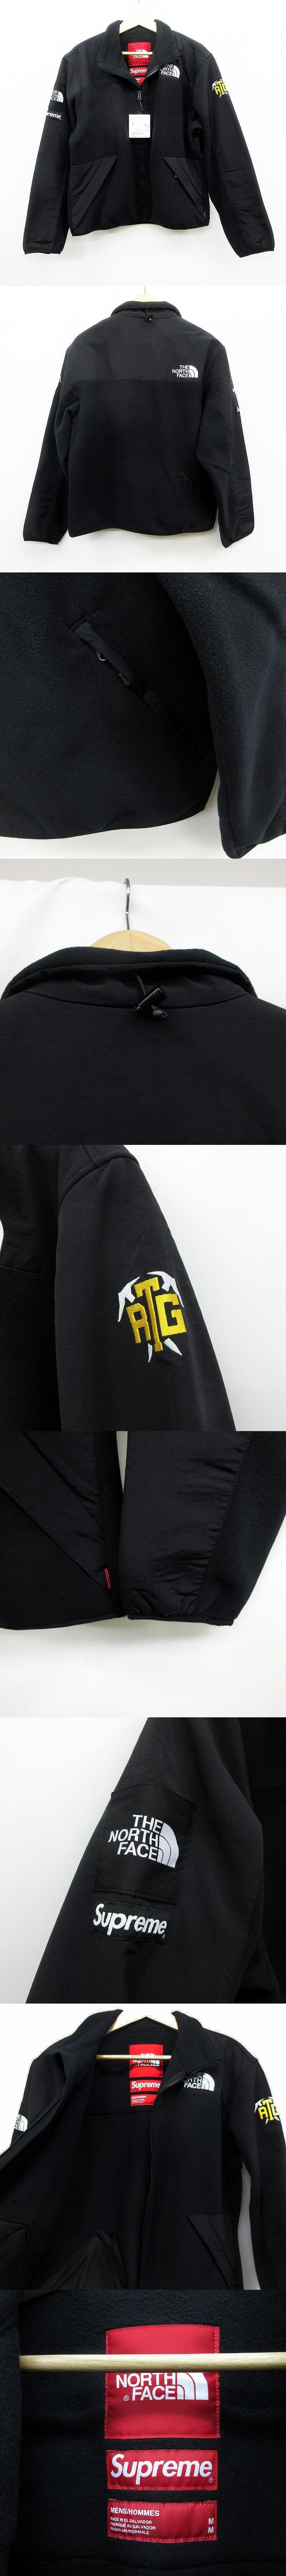 The North Face RTG Fleece Jacket M black ノースフェイス コラボレーション フリース ジャケット 黒  NA71904I